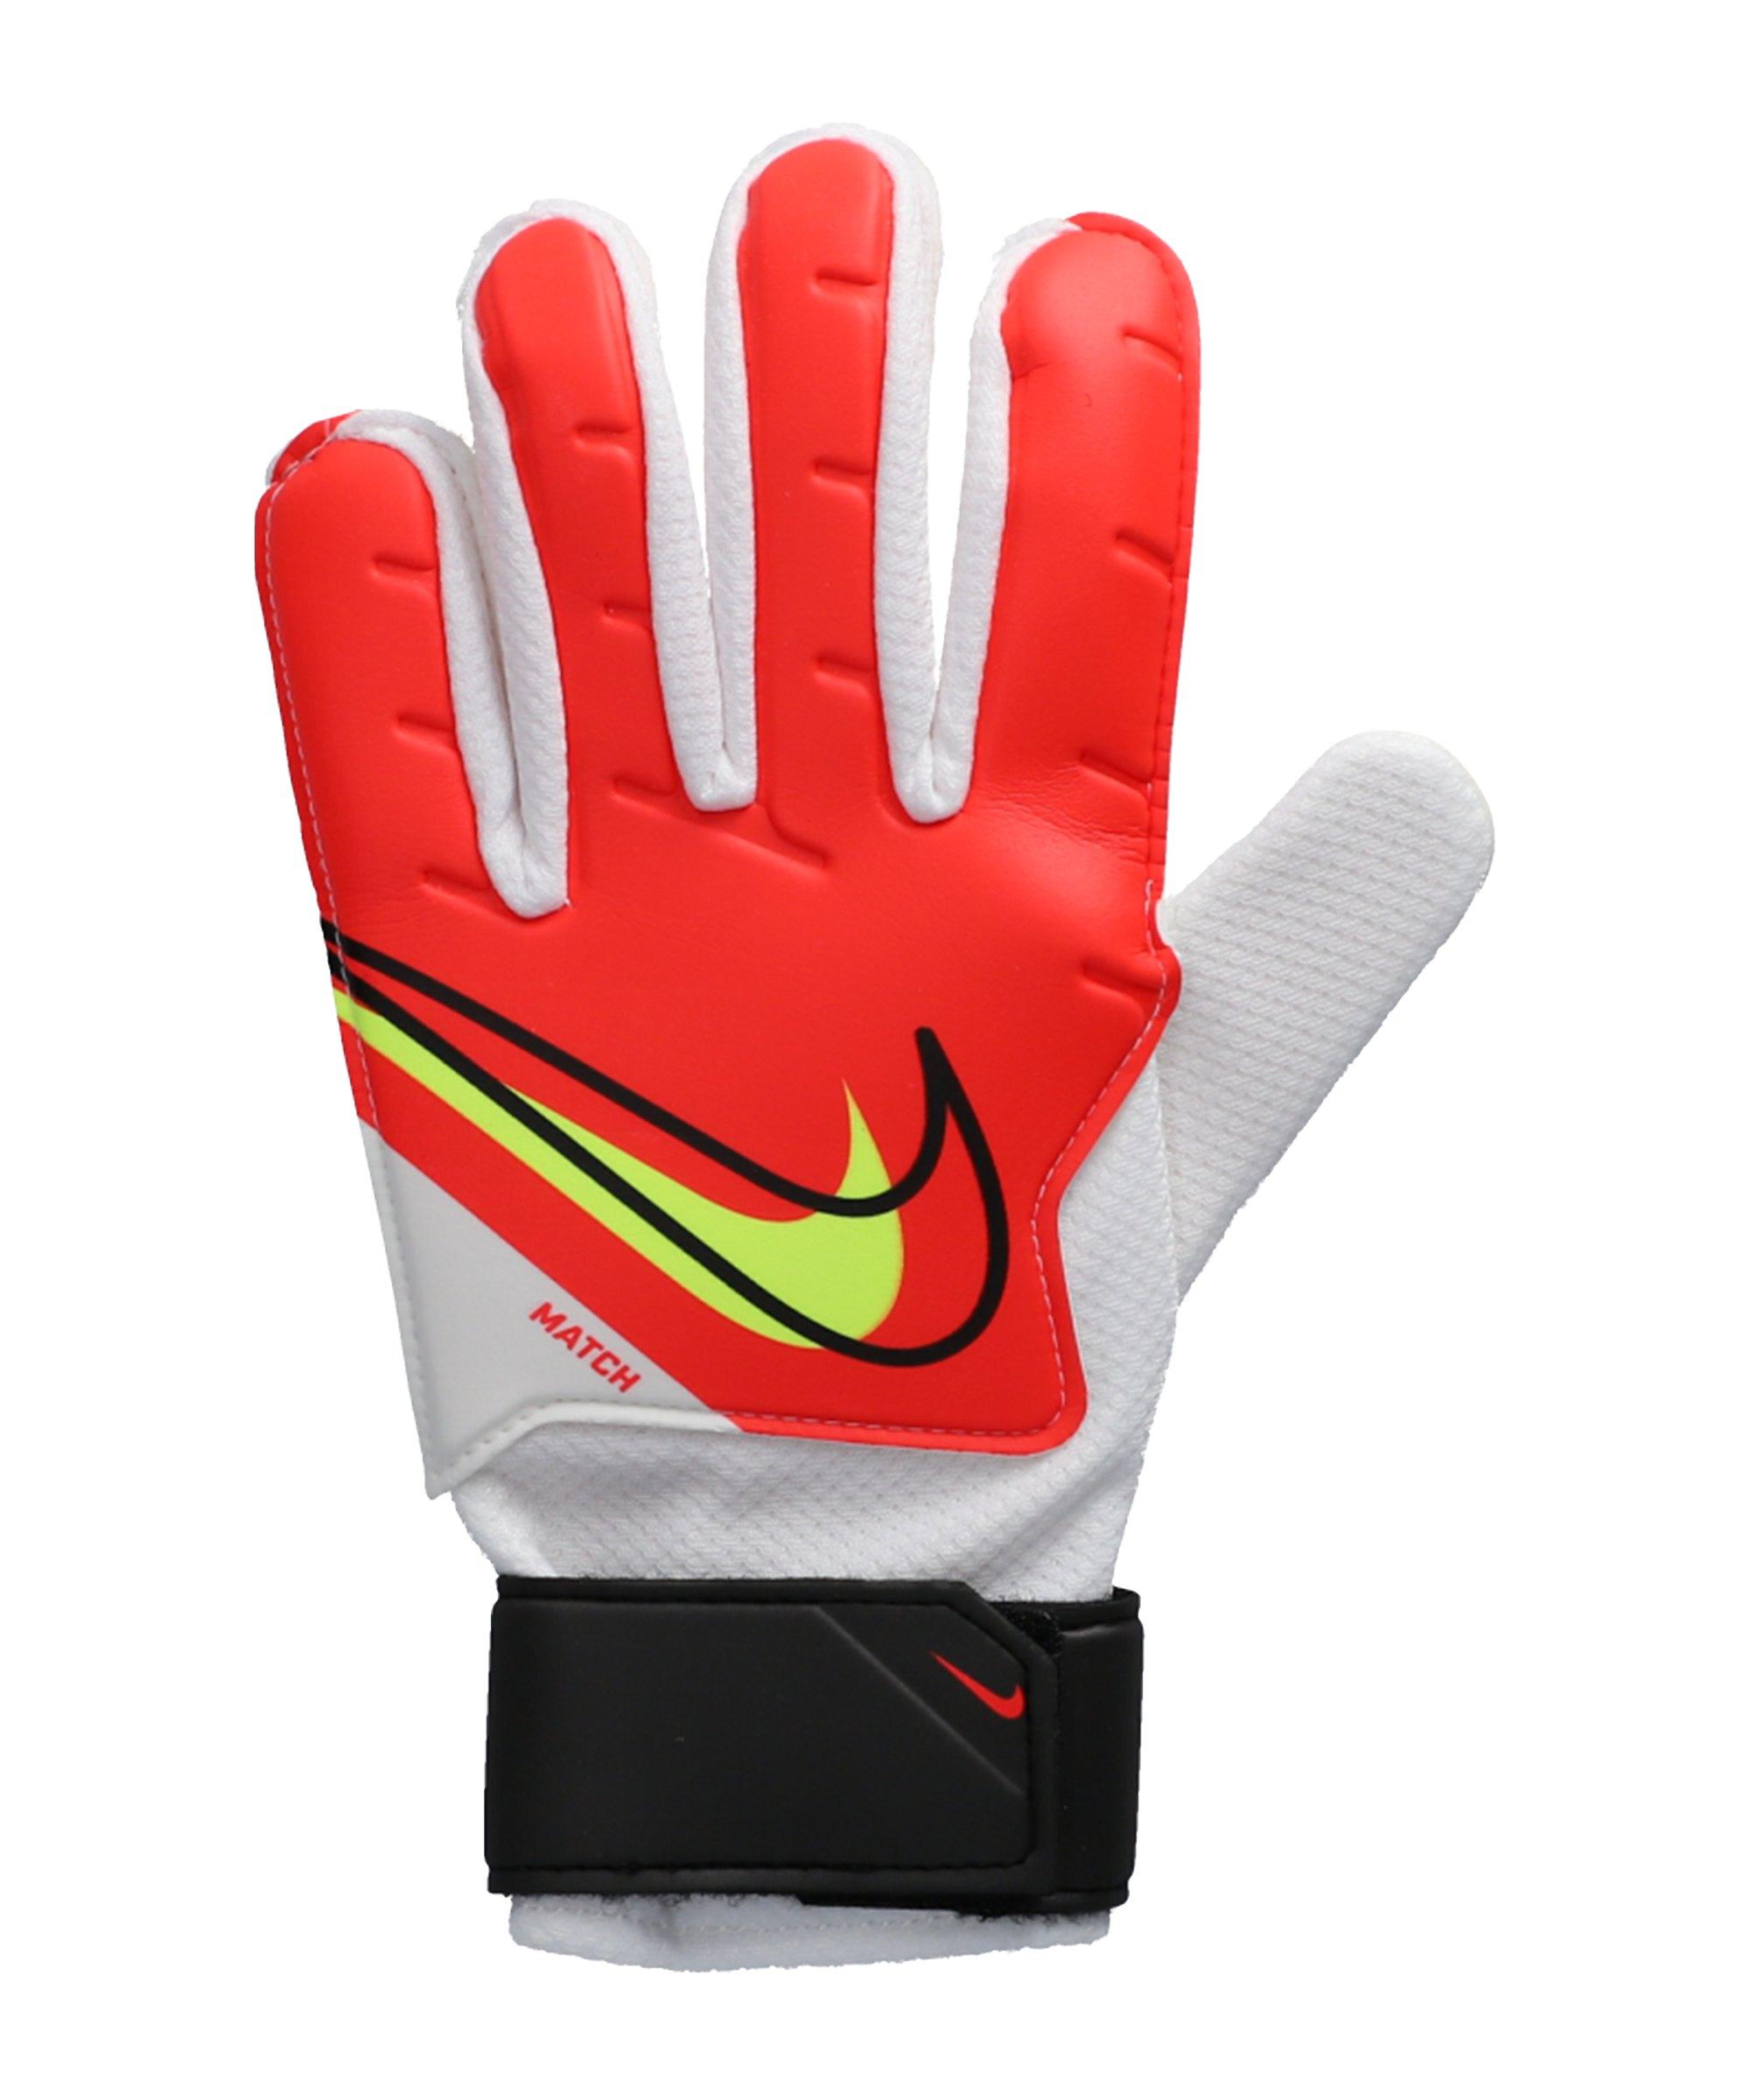 Nike Match Torwarthandschuh Rot Schwarz F636 - rot